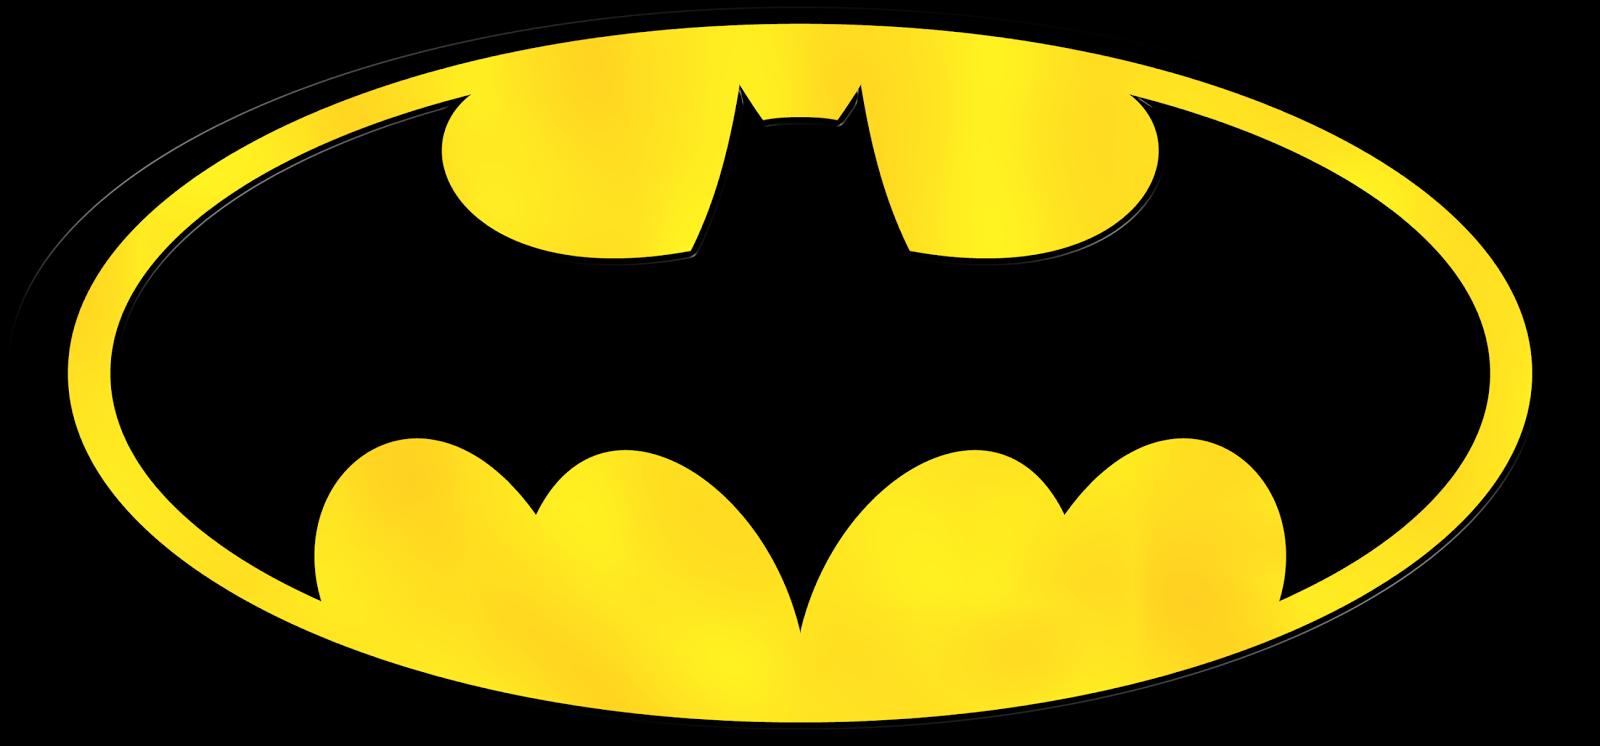 Face clipart batman. At getdrawings com free